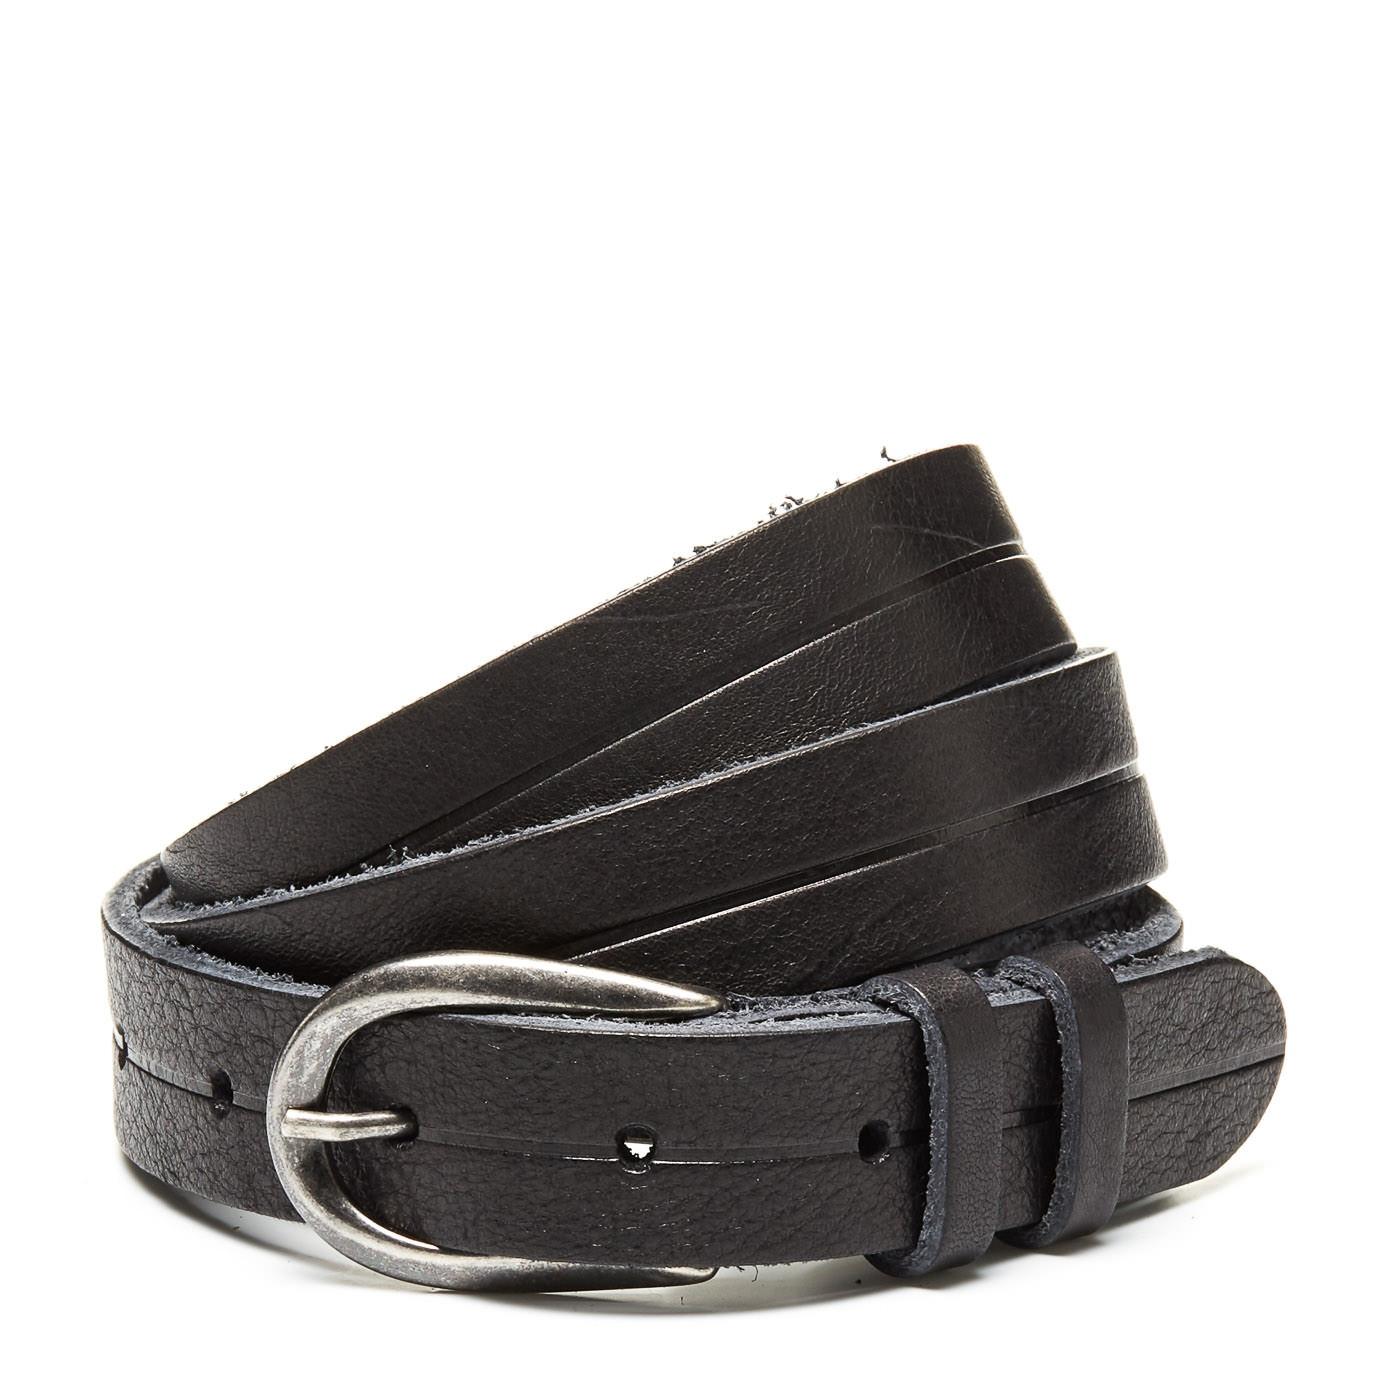 Cowboysbelt Black Dames Riem 252006-000100